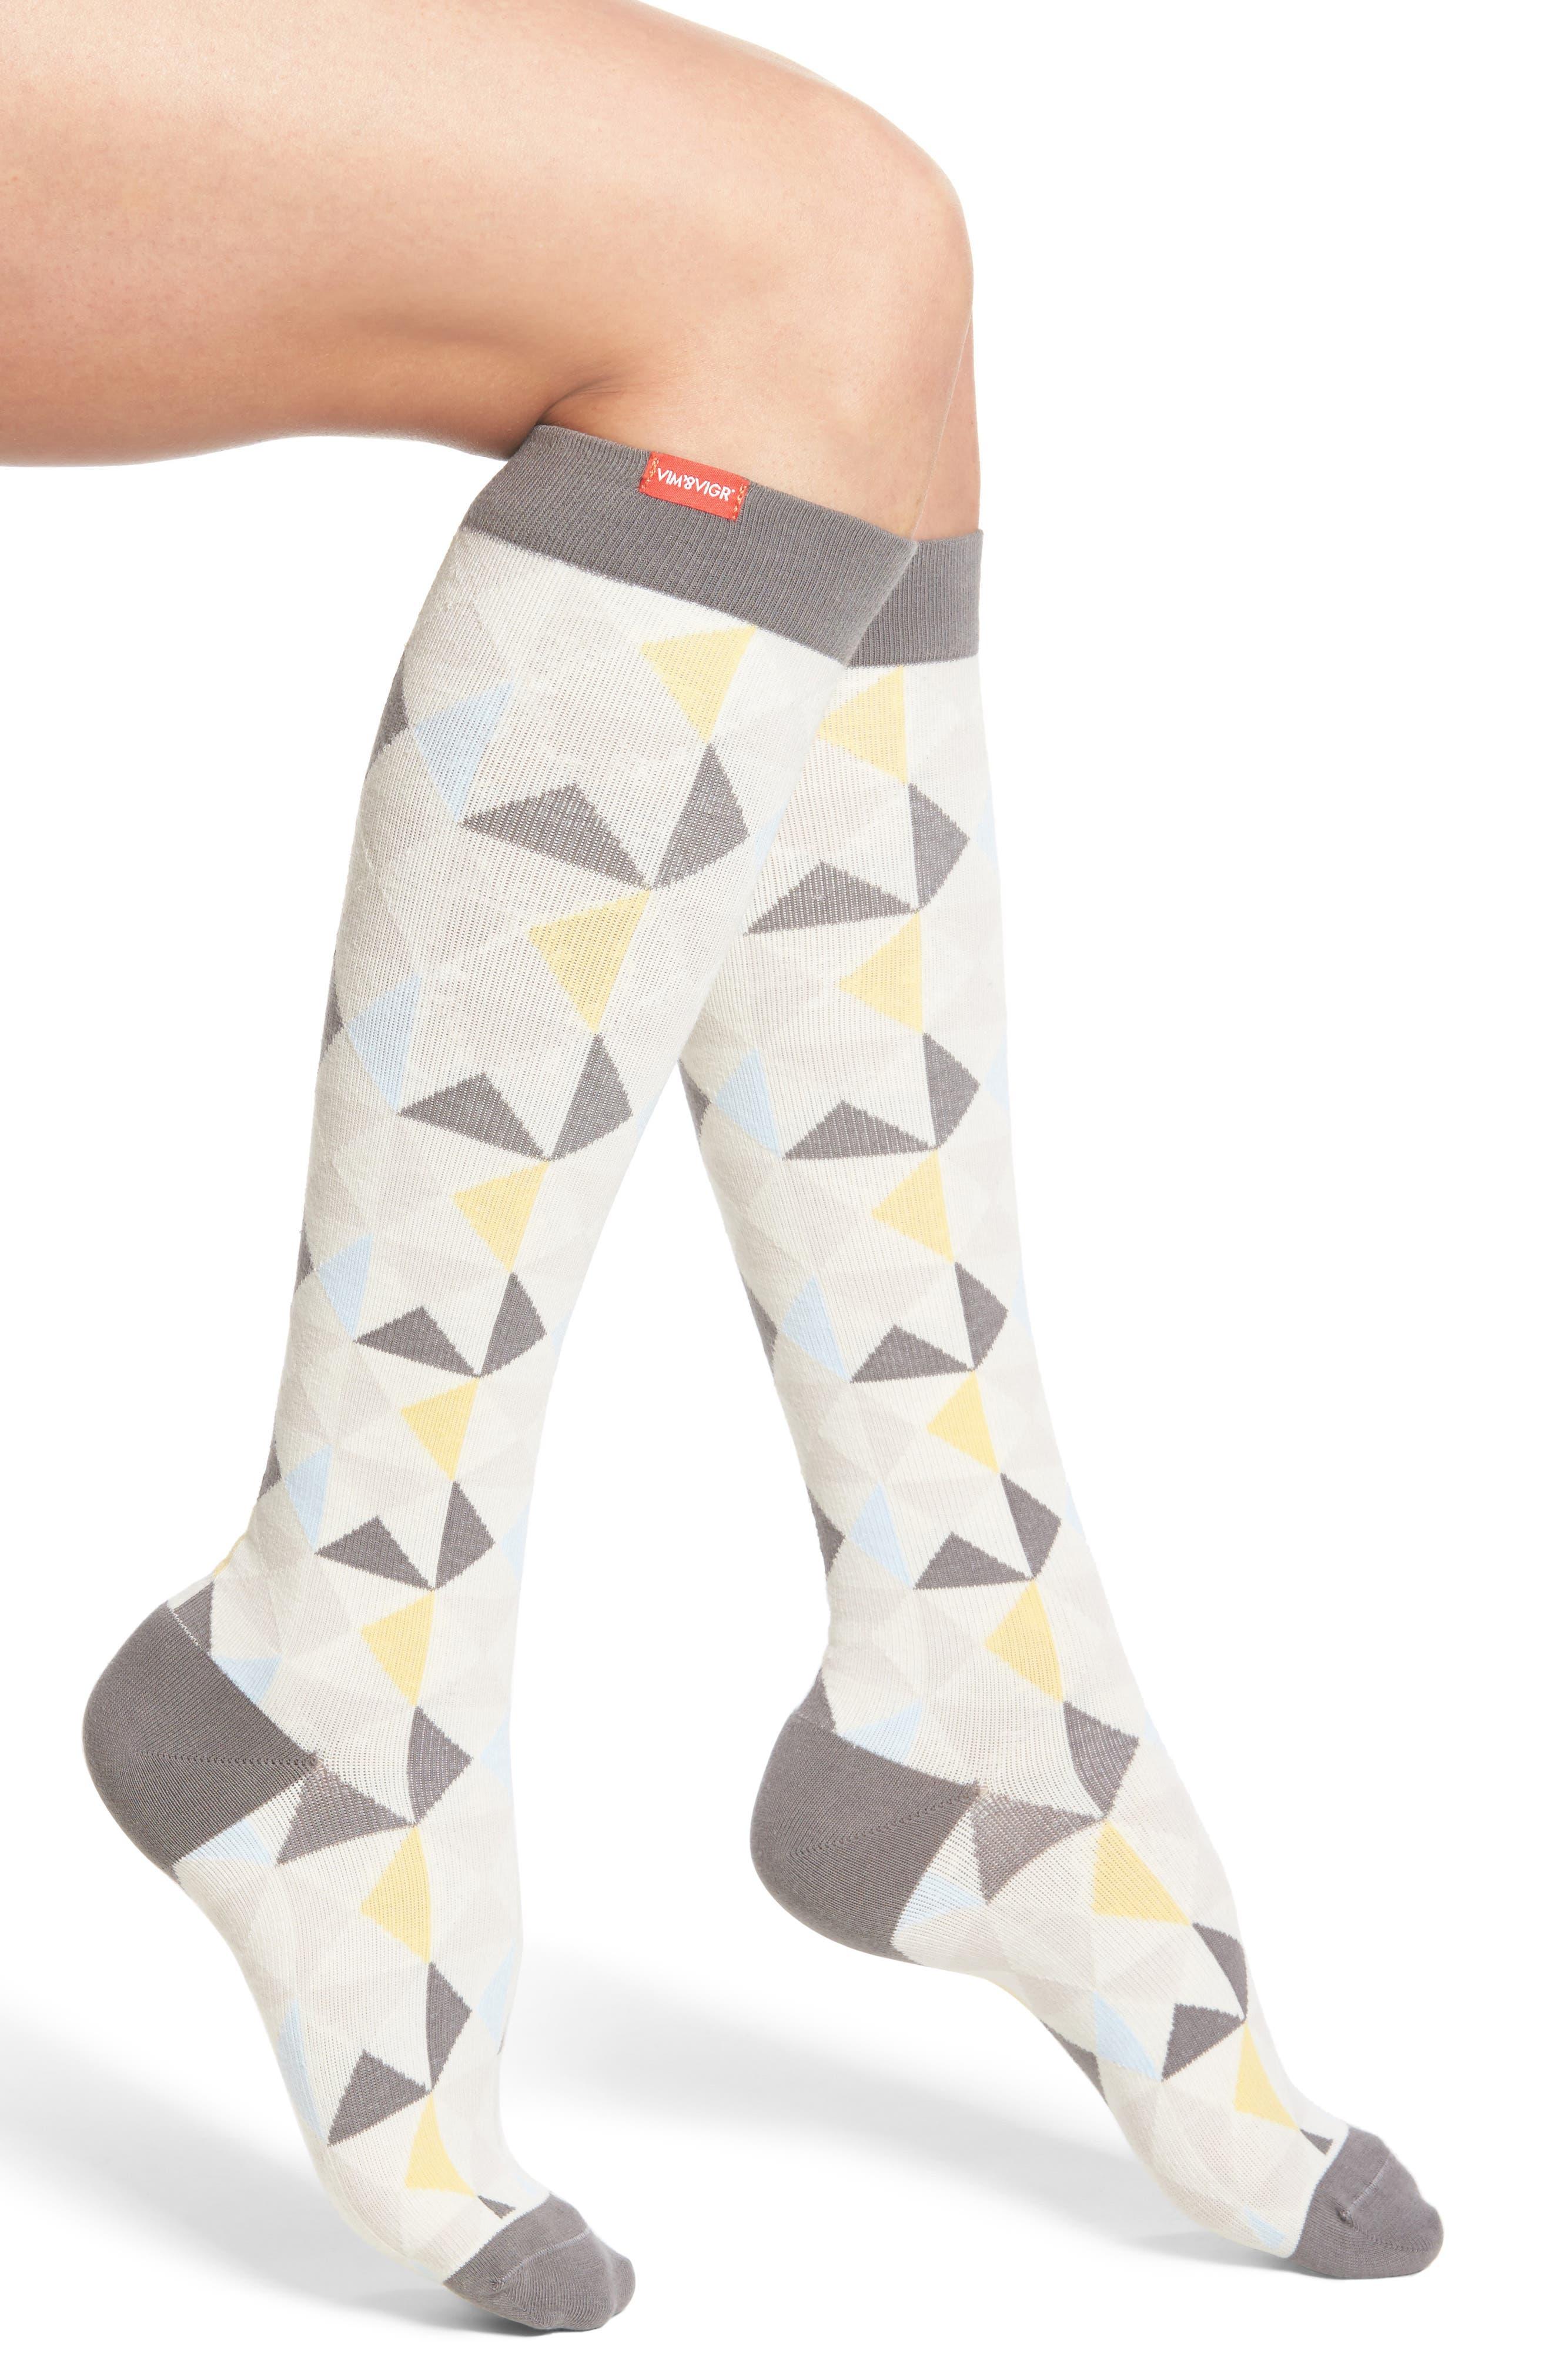 Compression Knee High Socks,                             Main thumbnail 1, color,                             Grey/ Gold